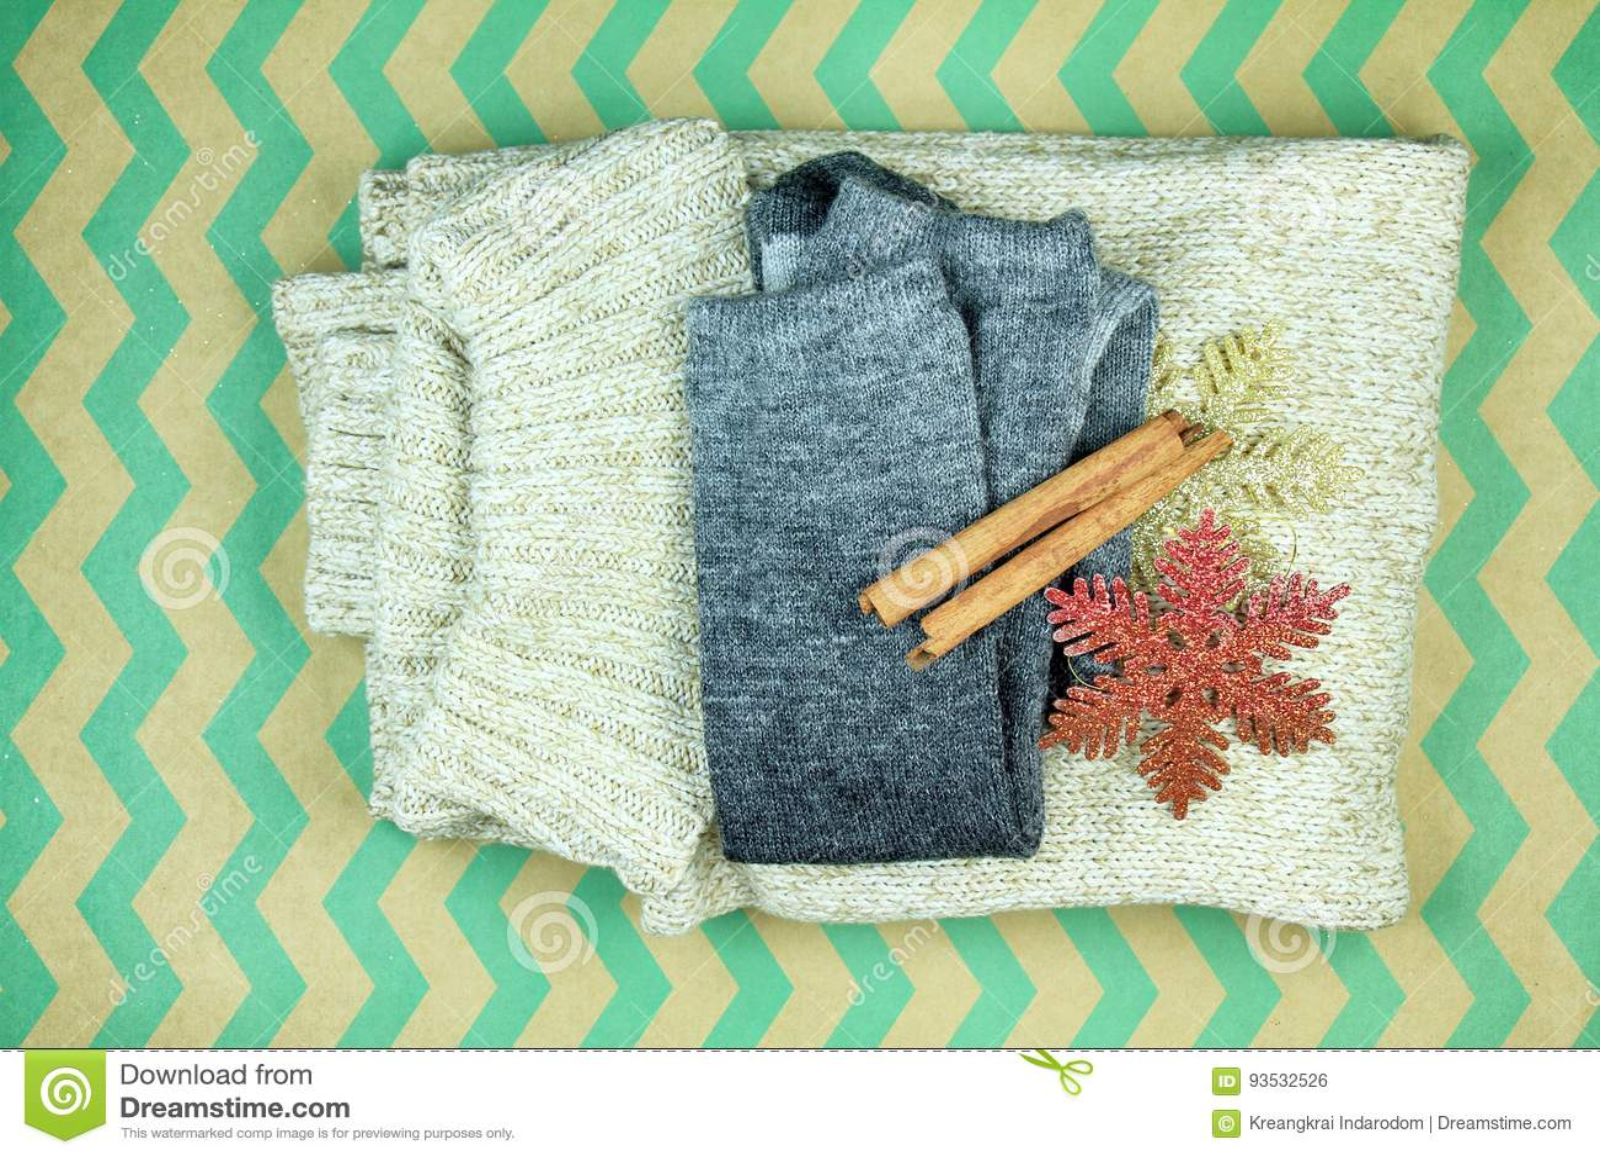 Warm winter closet.